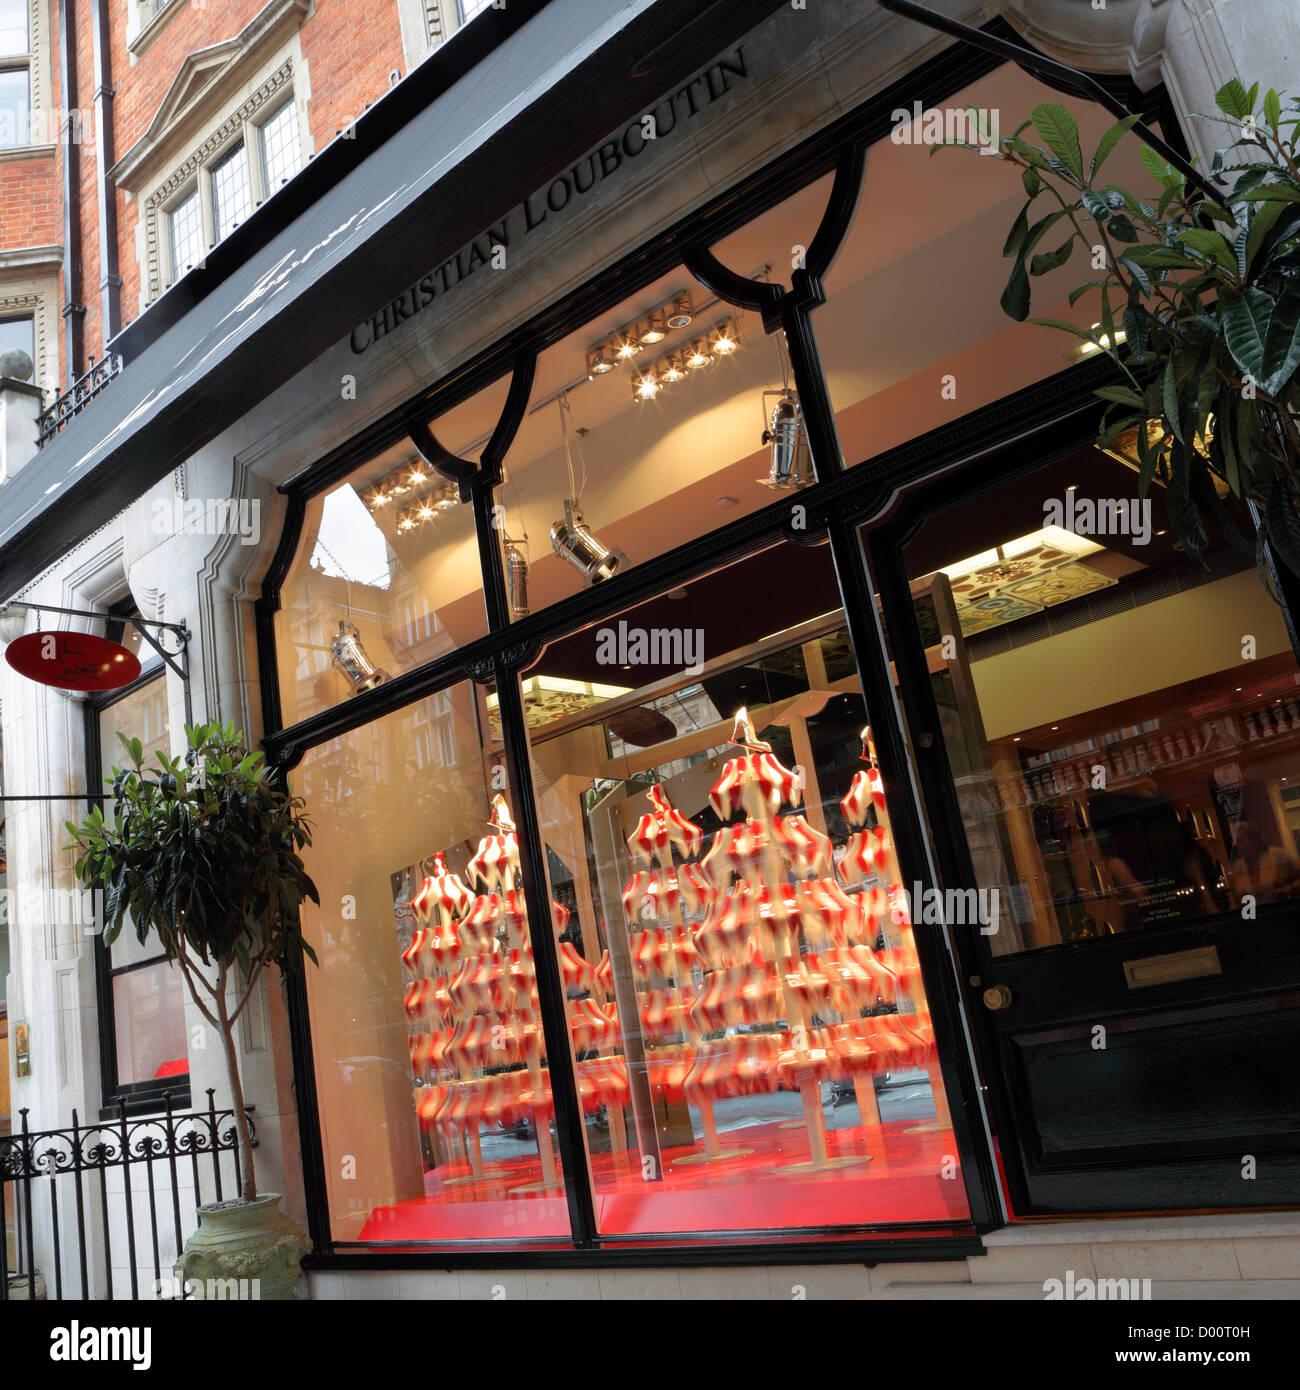 la meilleure attitude 9b7b7 a12ee Christian Louboutin Shop Window Photos & Christian Louboutin ...